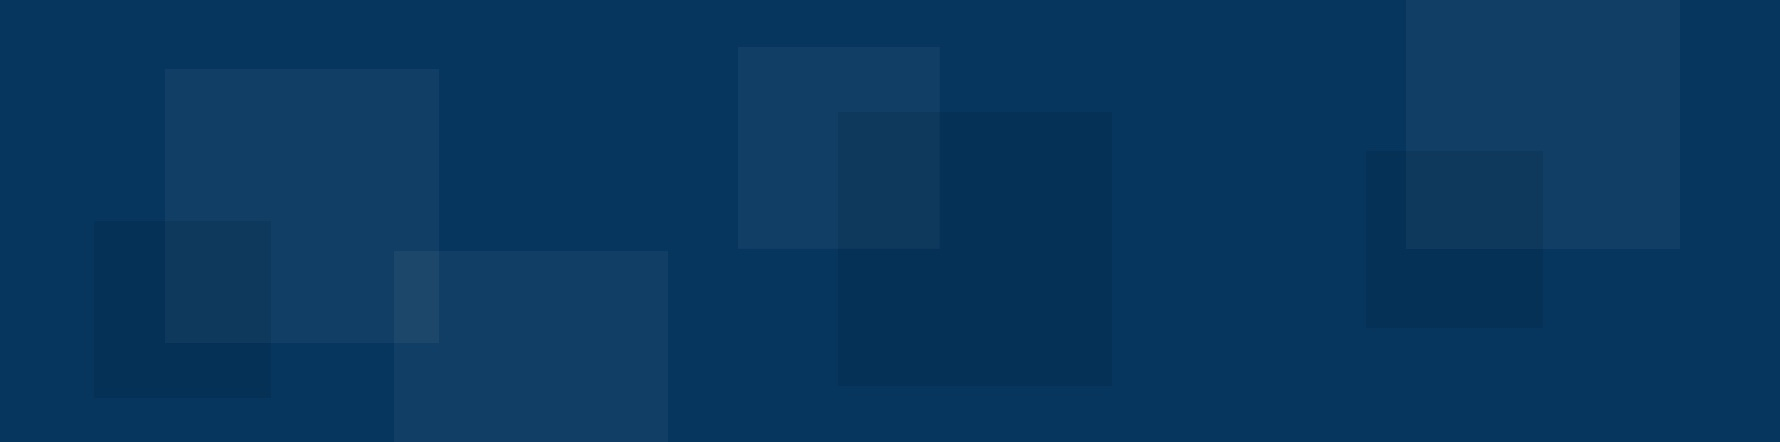 rectangular pattern blue